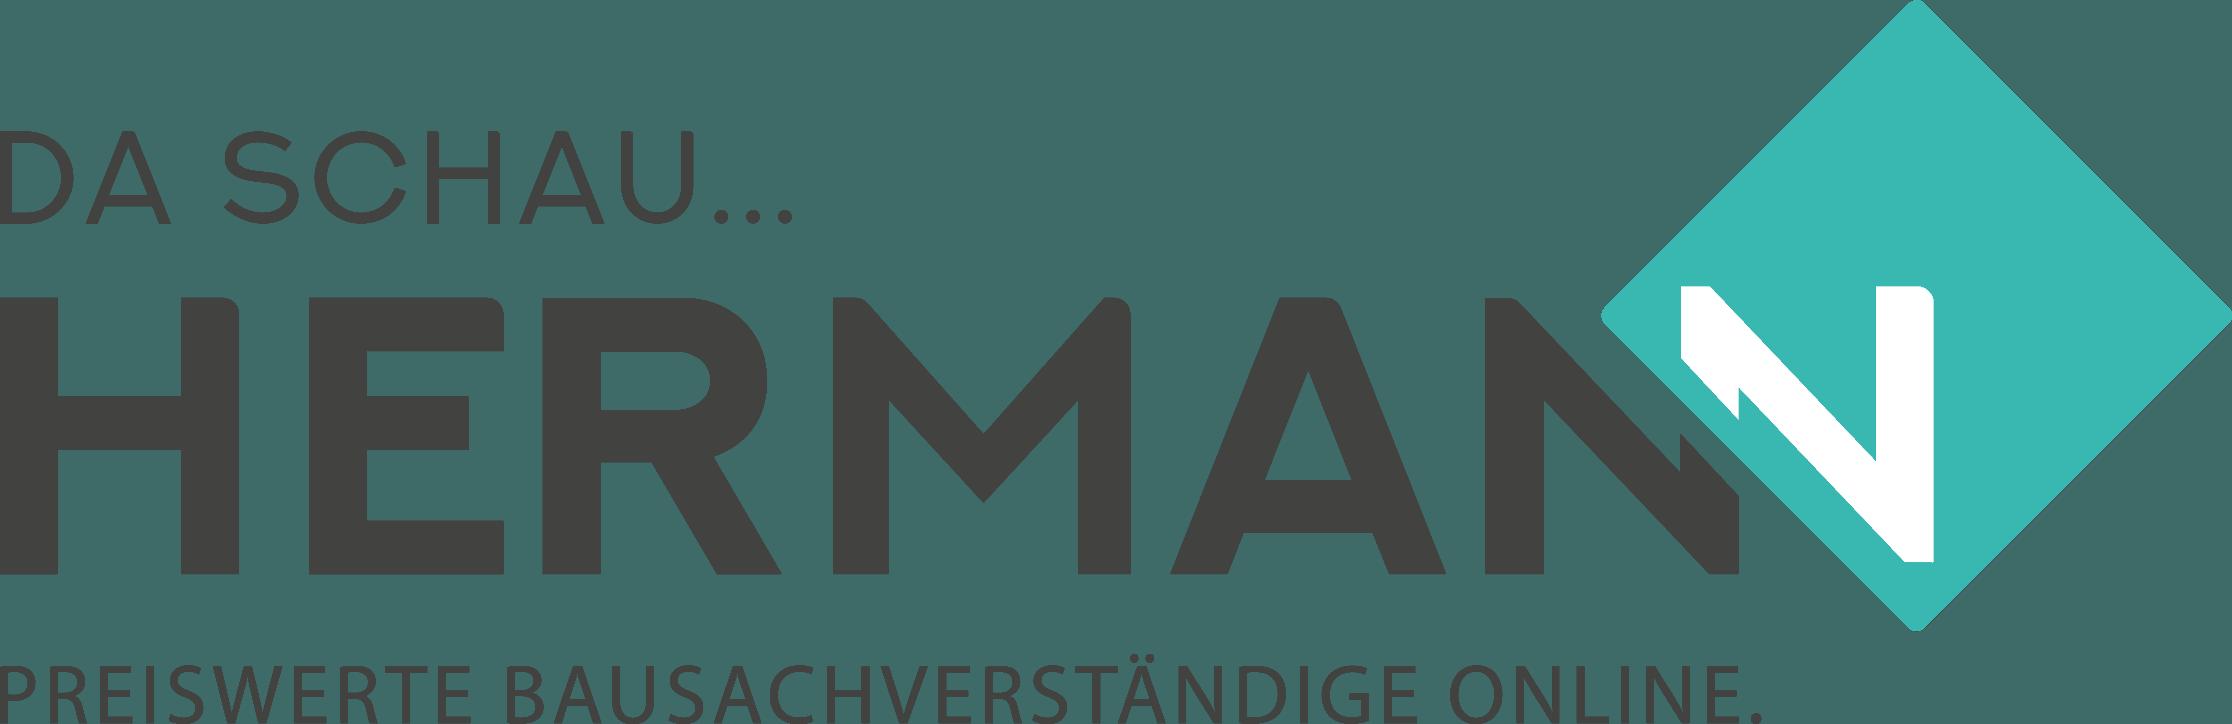 https://converts.at/wp-content/uploads/2020/08/Hermann-Logo-4c-rgb-copy.png